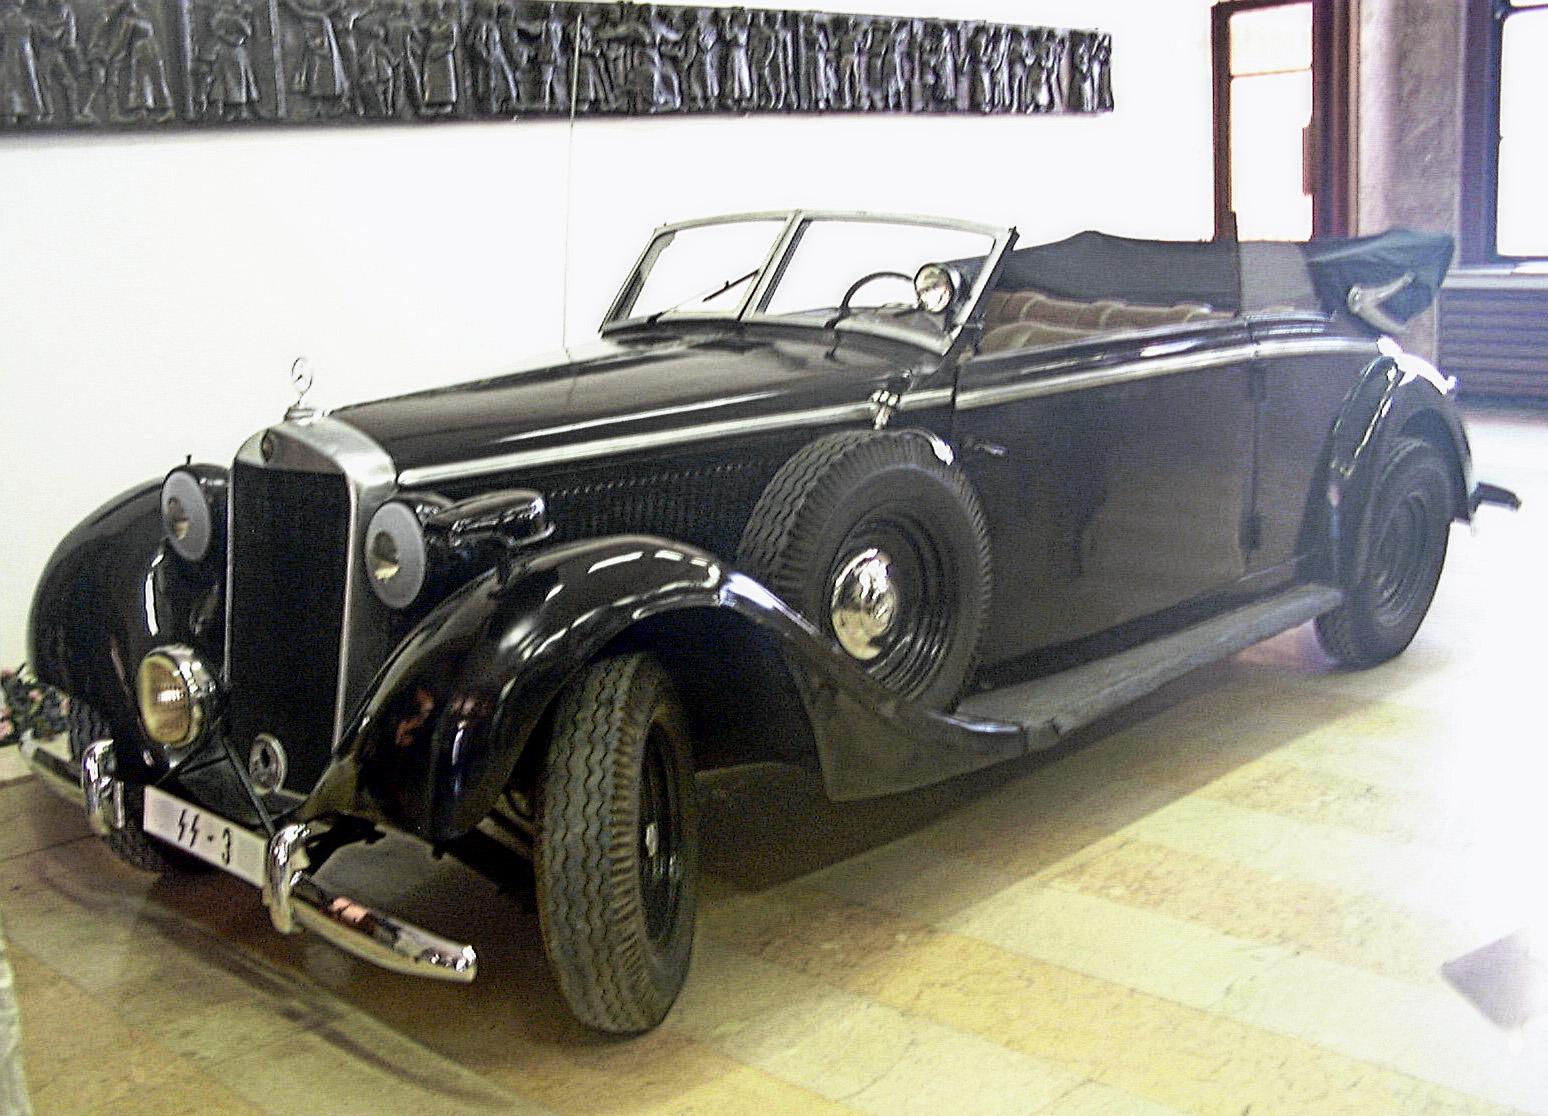 File:Heydrich's car.jpg - Wikimedia Commons